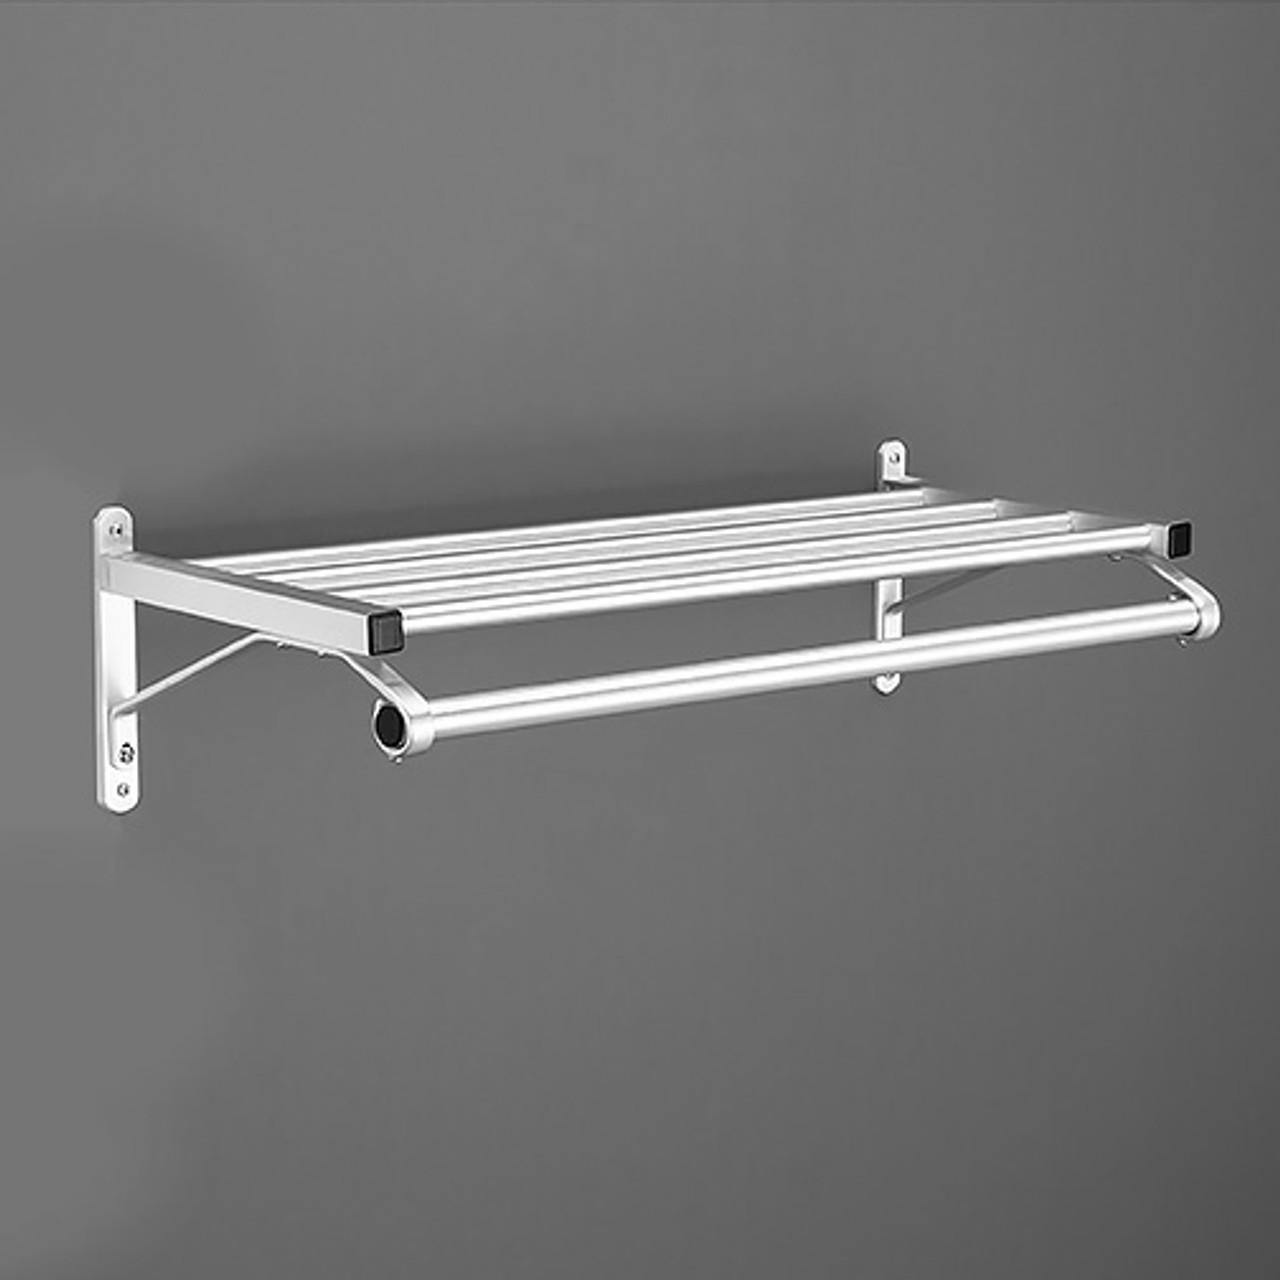 glaro coat rack 501 36 sa 36 inches wall mount hanger rod aluminum